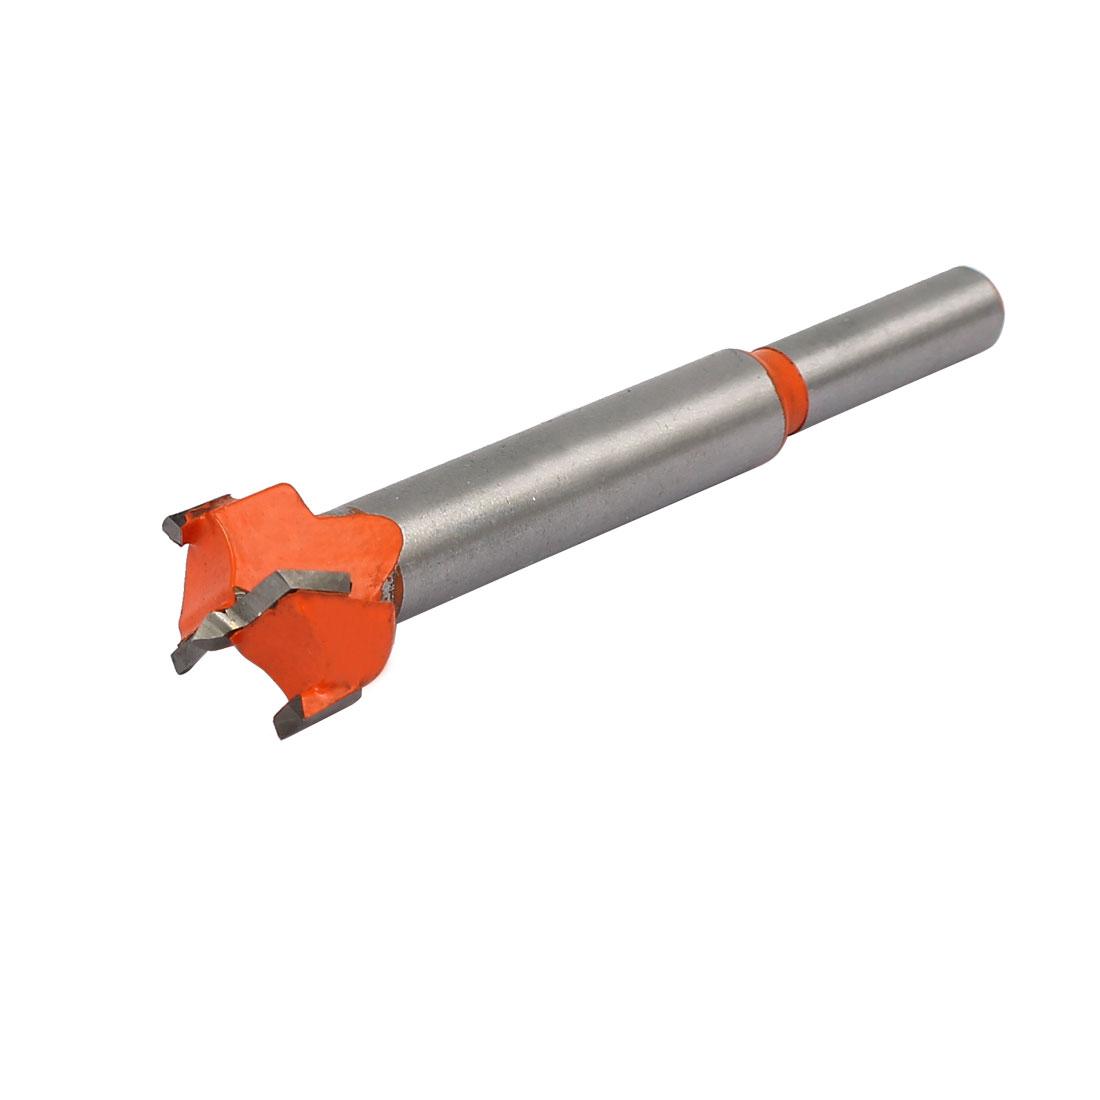 19mm Dia Carbide Tip Wood Drilling Cutting Hinge Boring Bit Drill Tool Orange